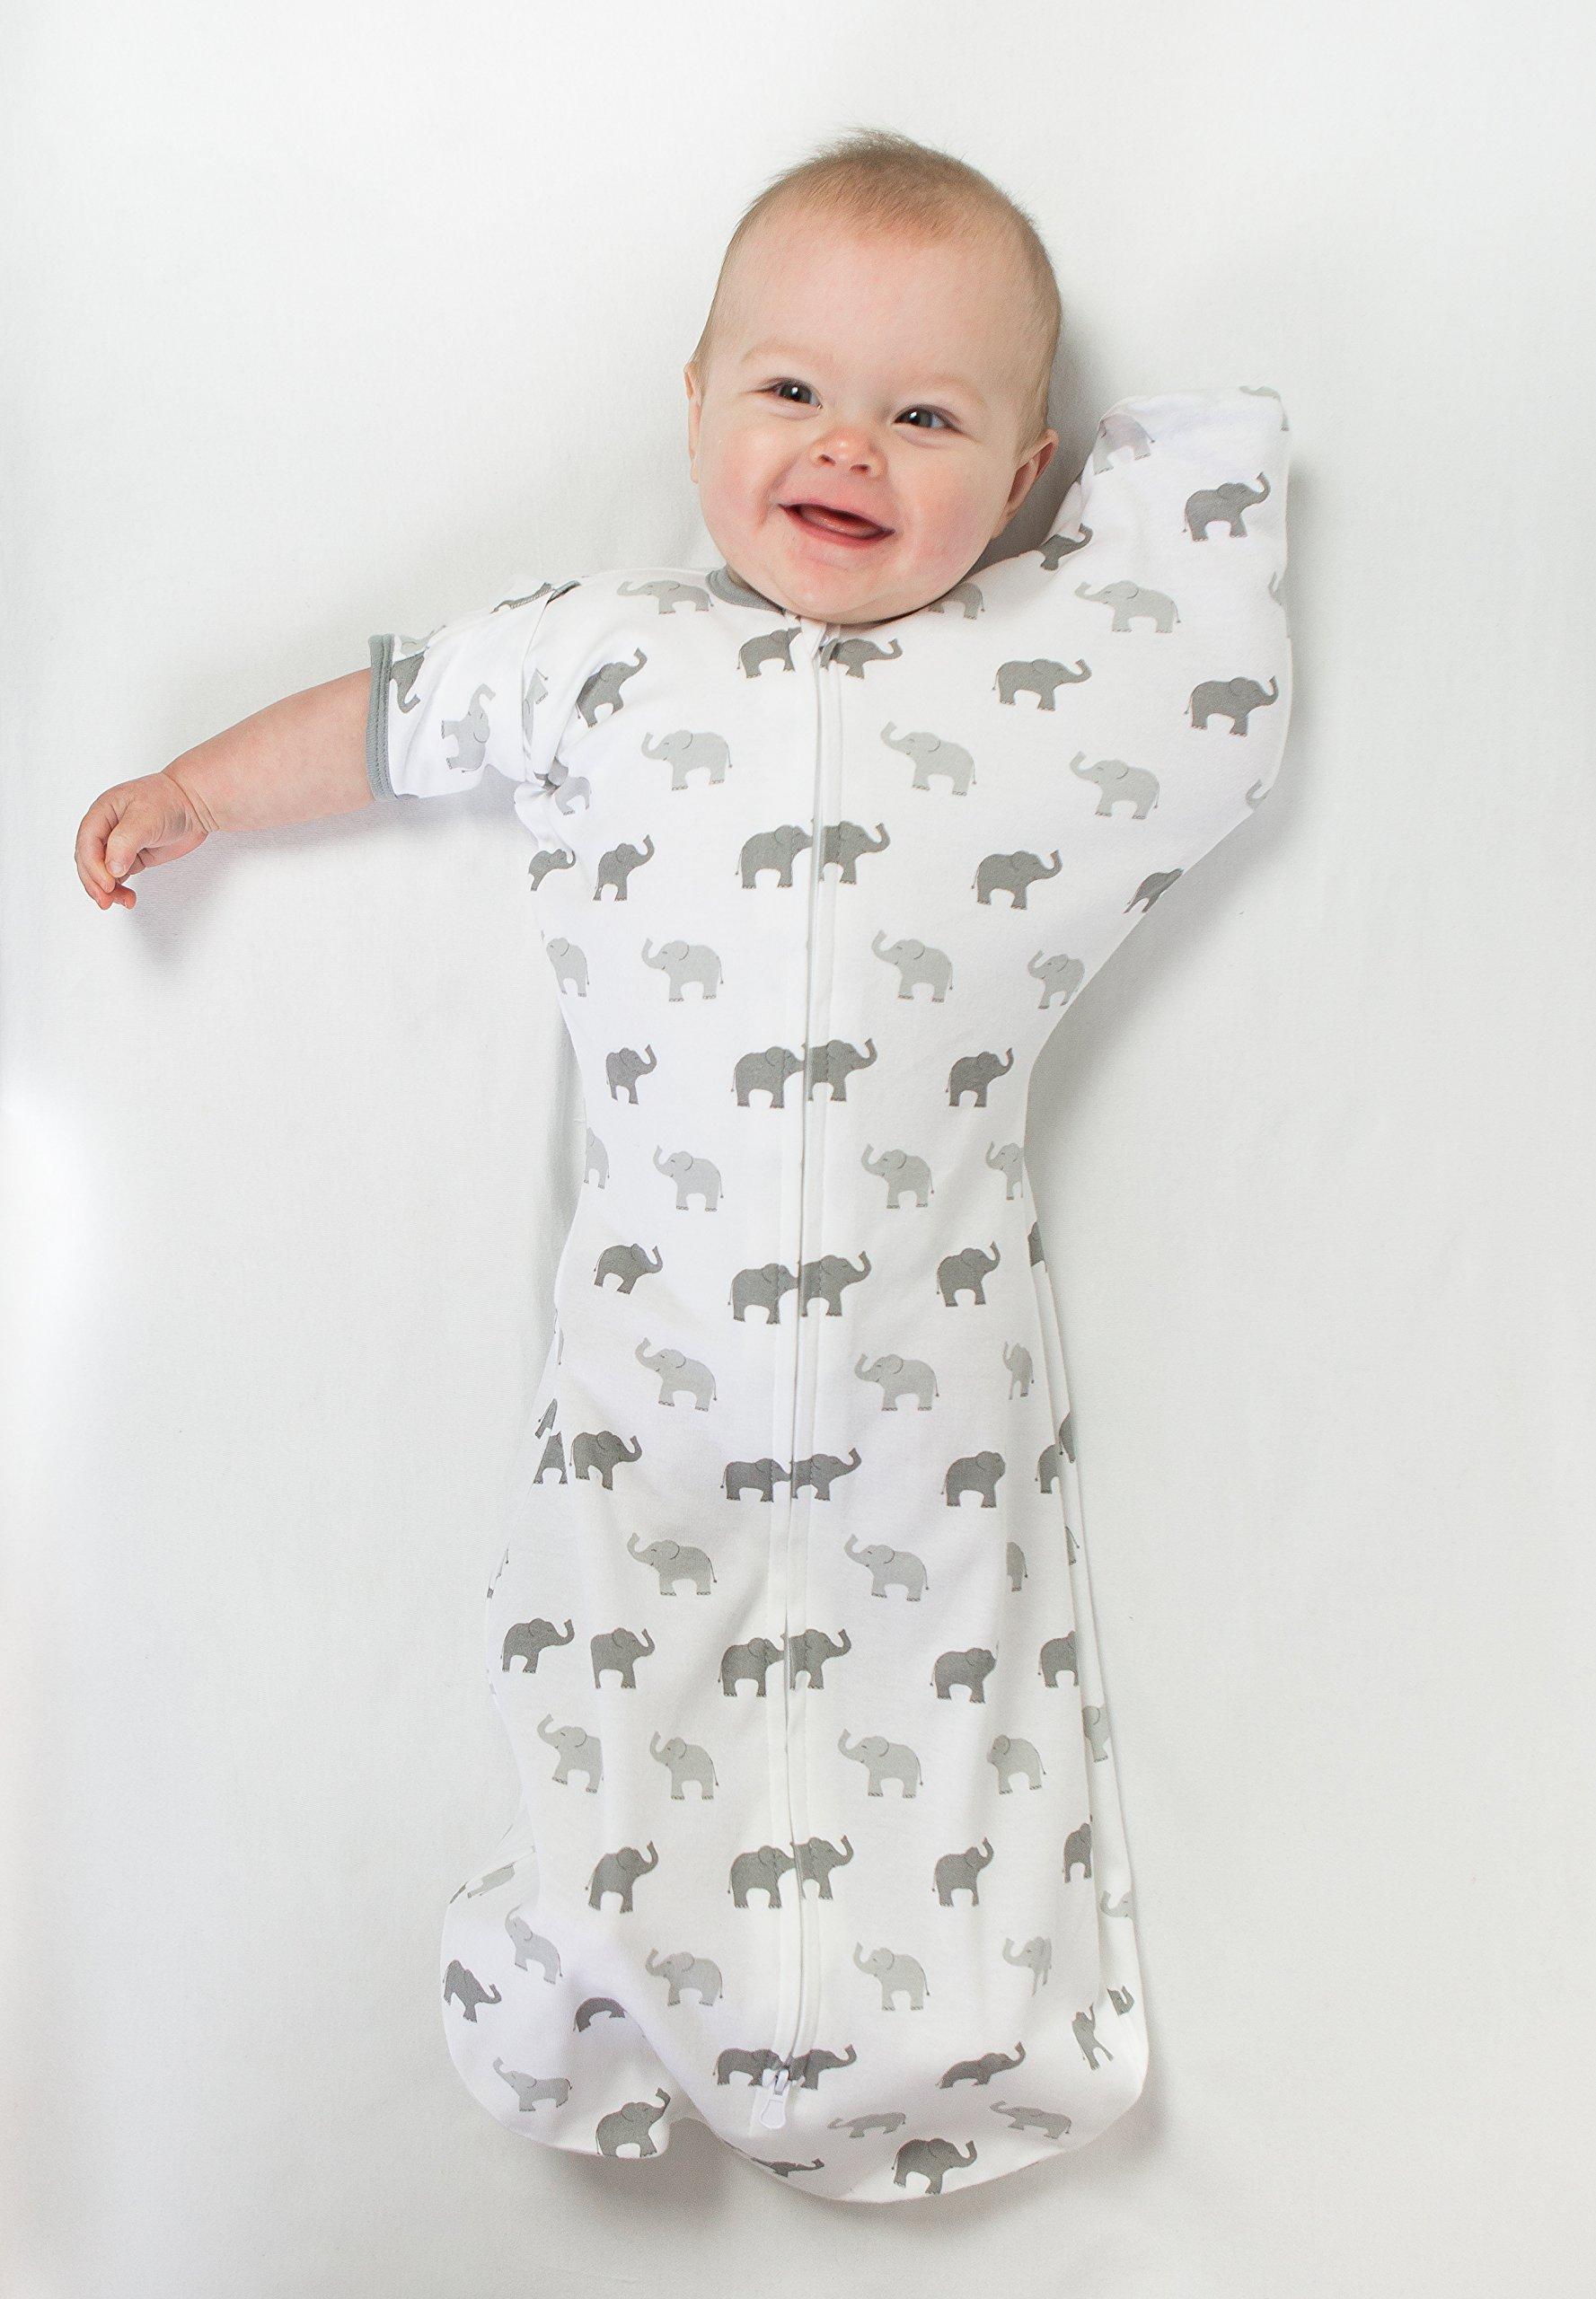 Amazing Baby - Saco de dormir para bebé con brazos, Elefantes pequeños azules, Azul, Medium (3-6 Month) 8